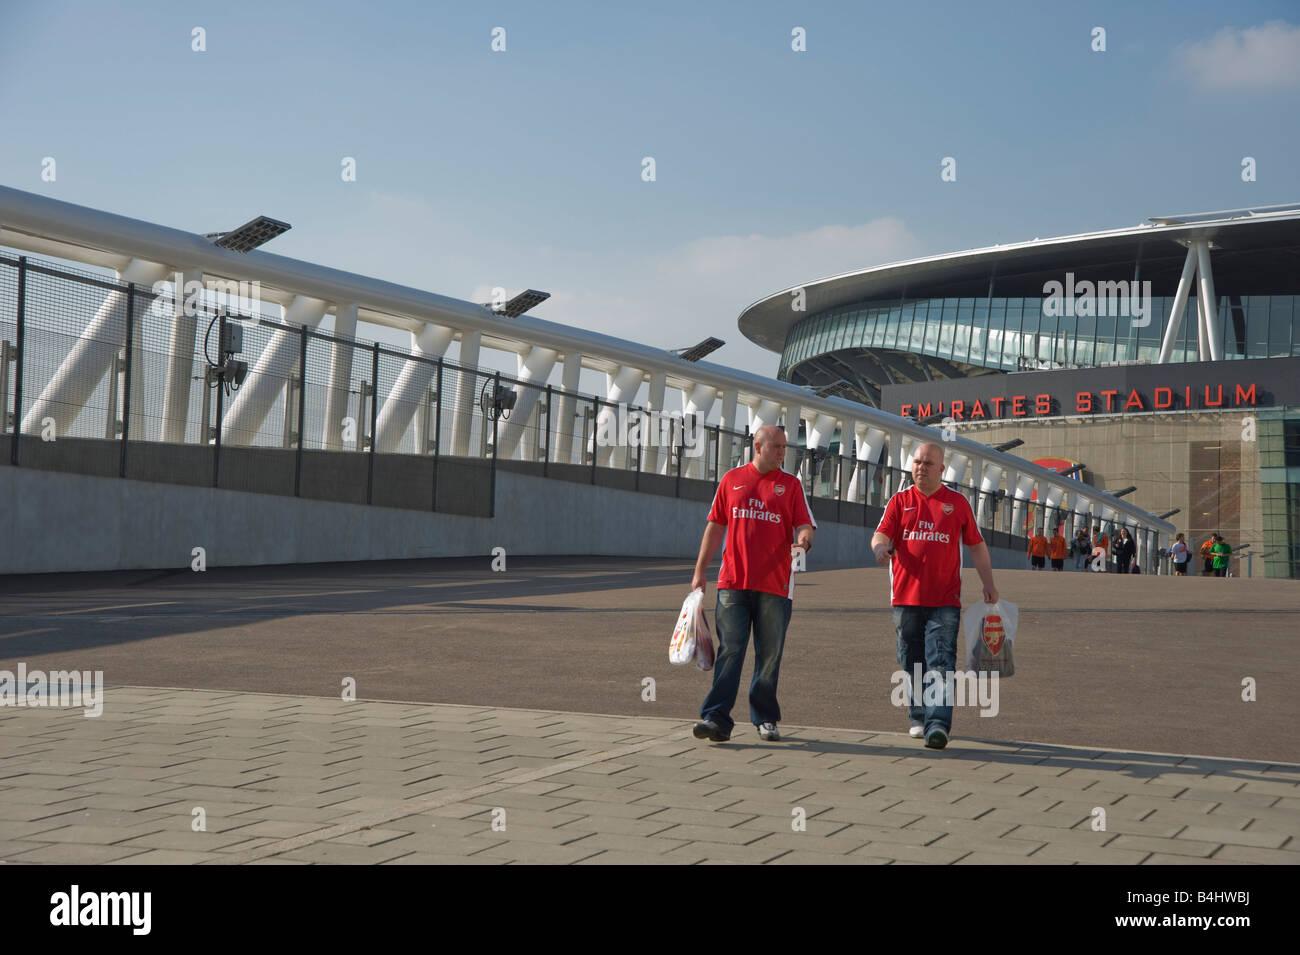 Zwei Arsenal-Fans Arsenal Hemden und Arsenal Träger Tragetaschen. Stockbild